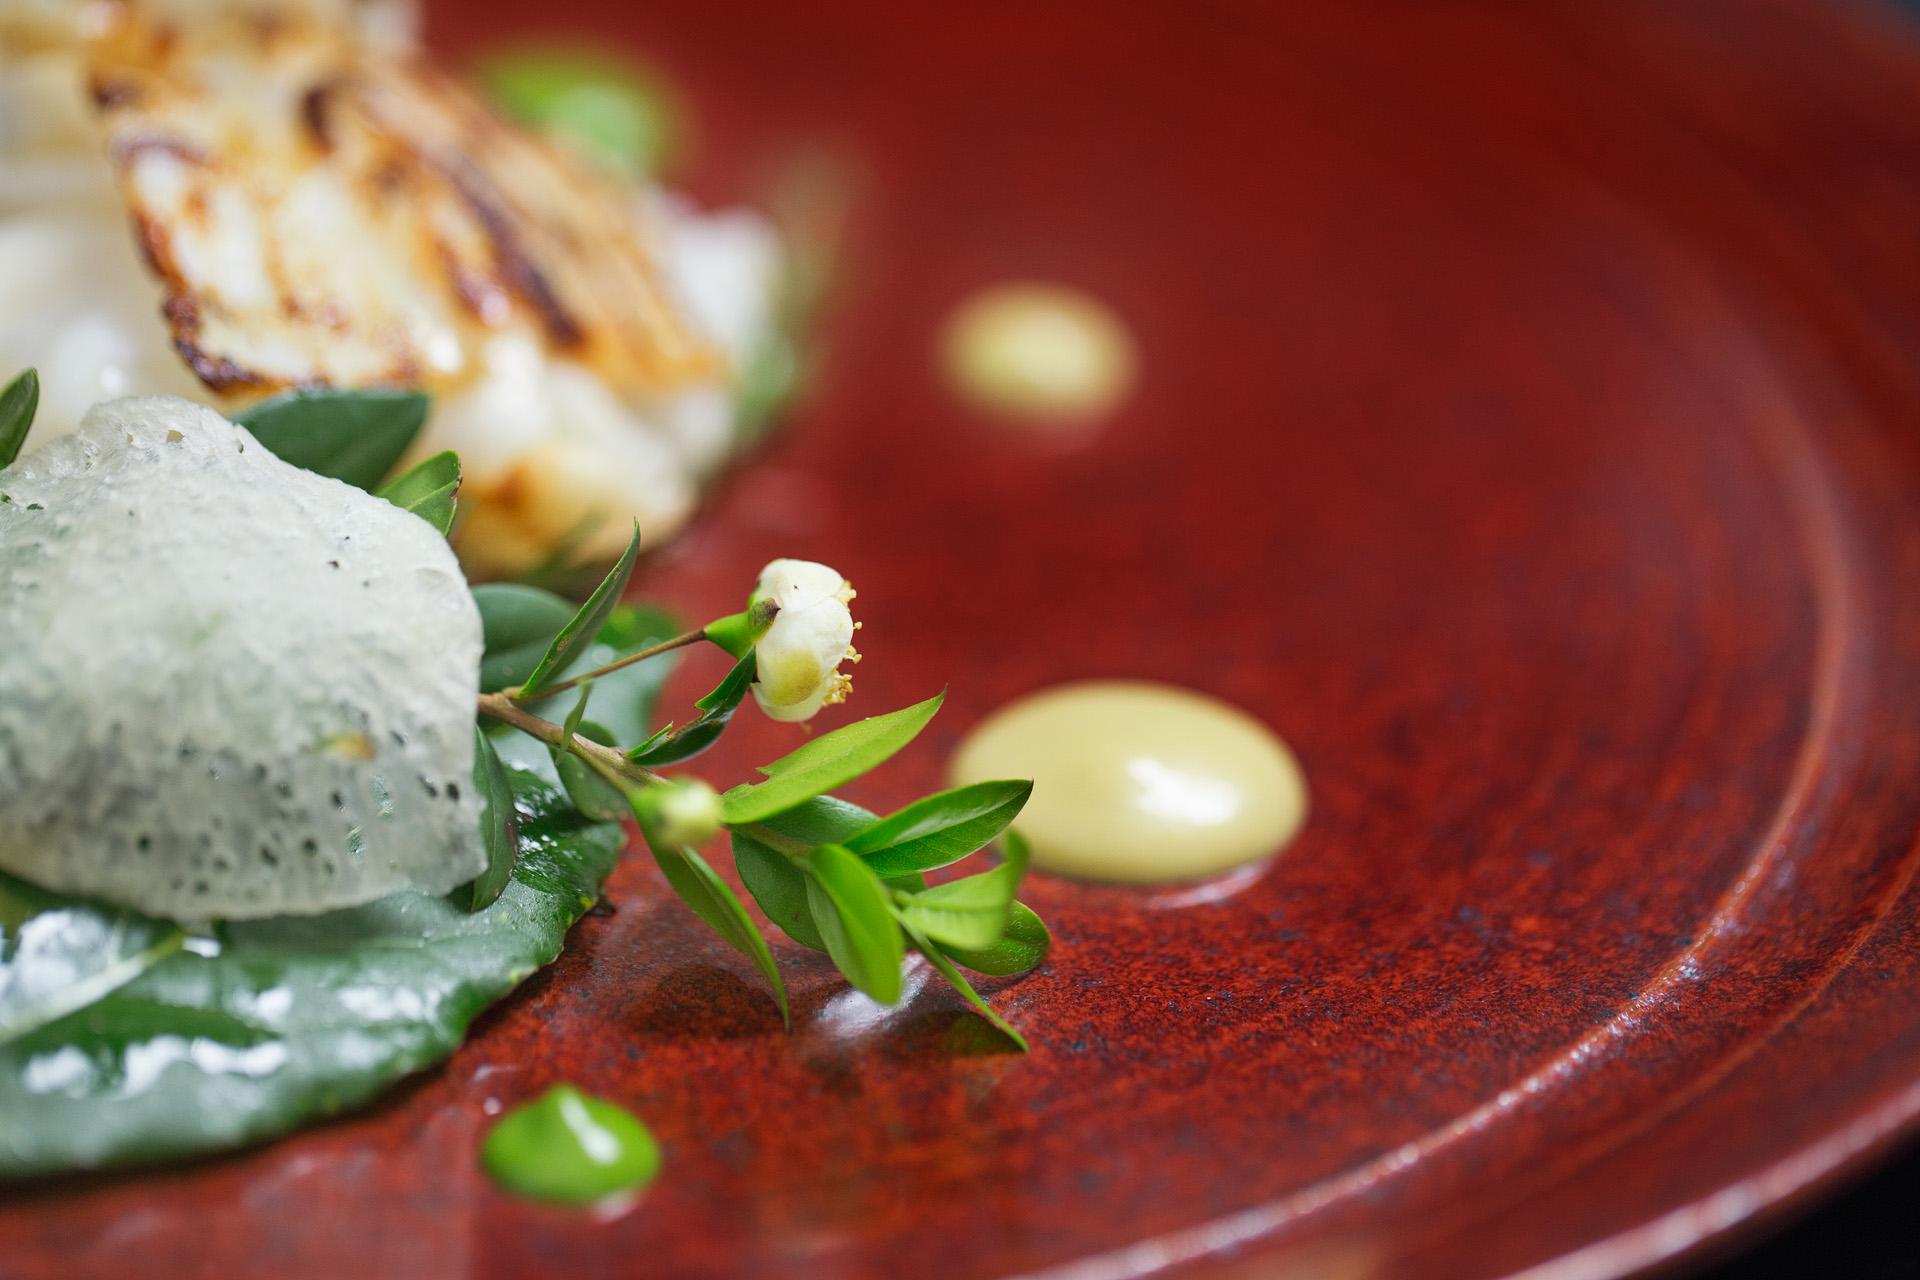 Kyoto Shokunin Kobo e lo chef Gianfranco Pascucci nel ristorante Doozo